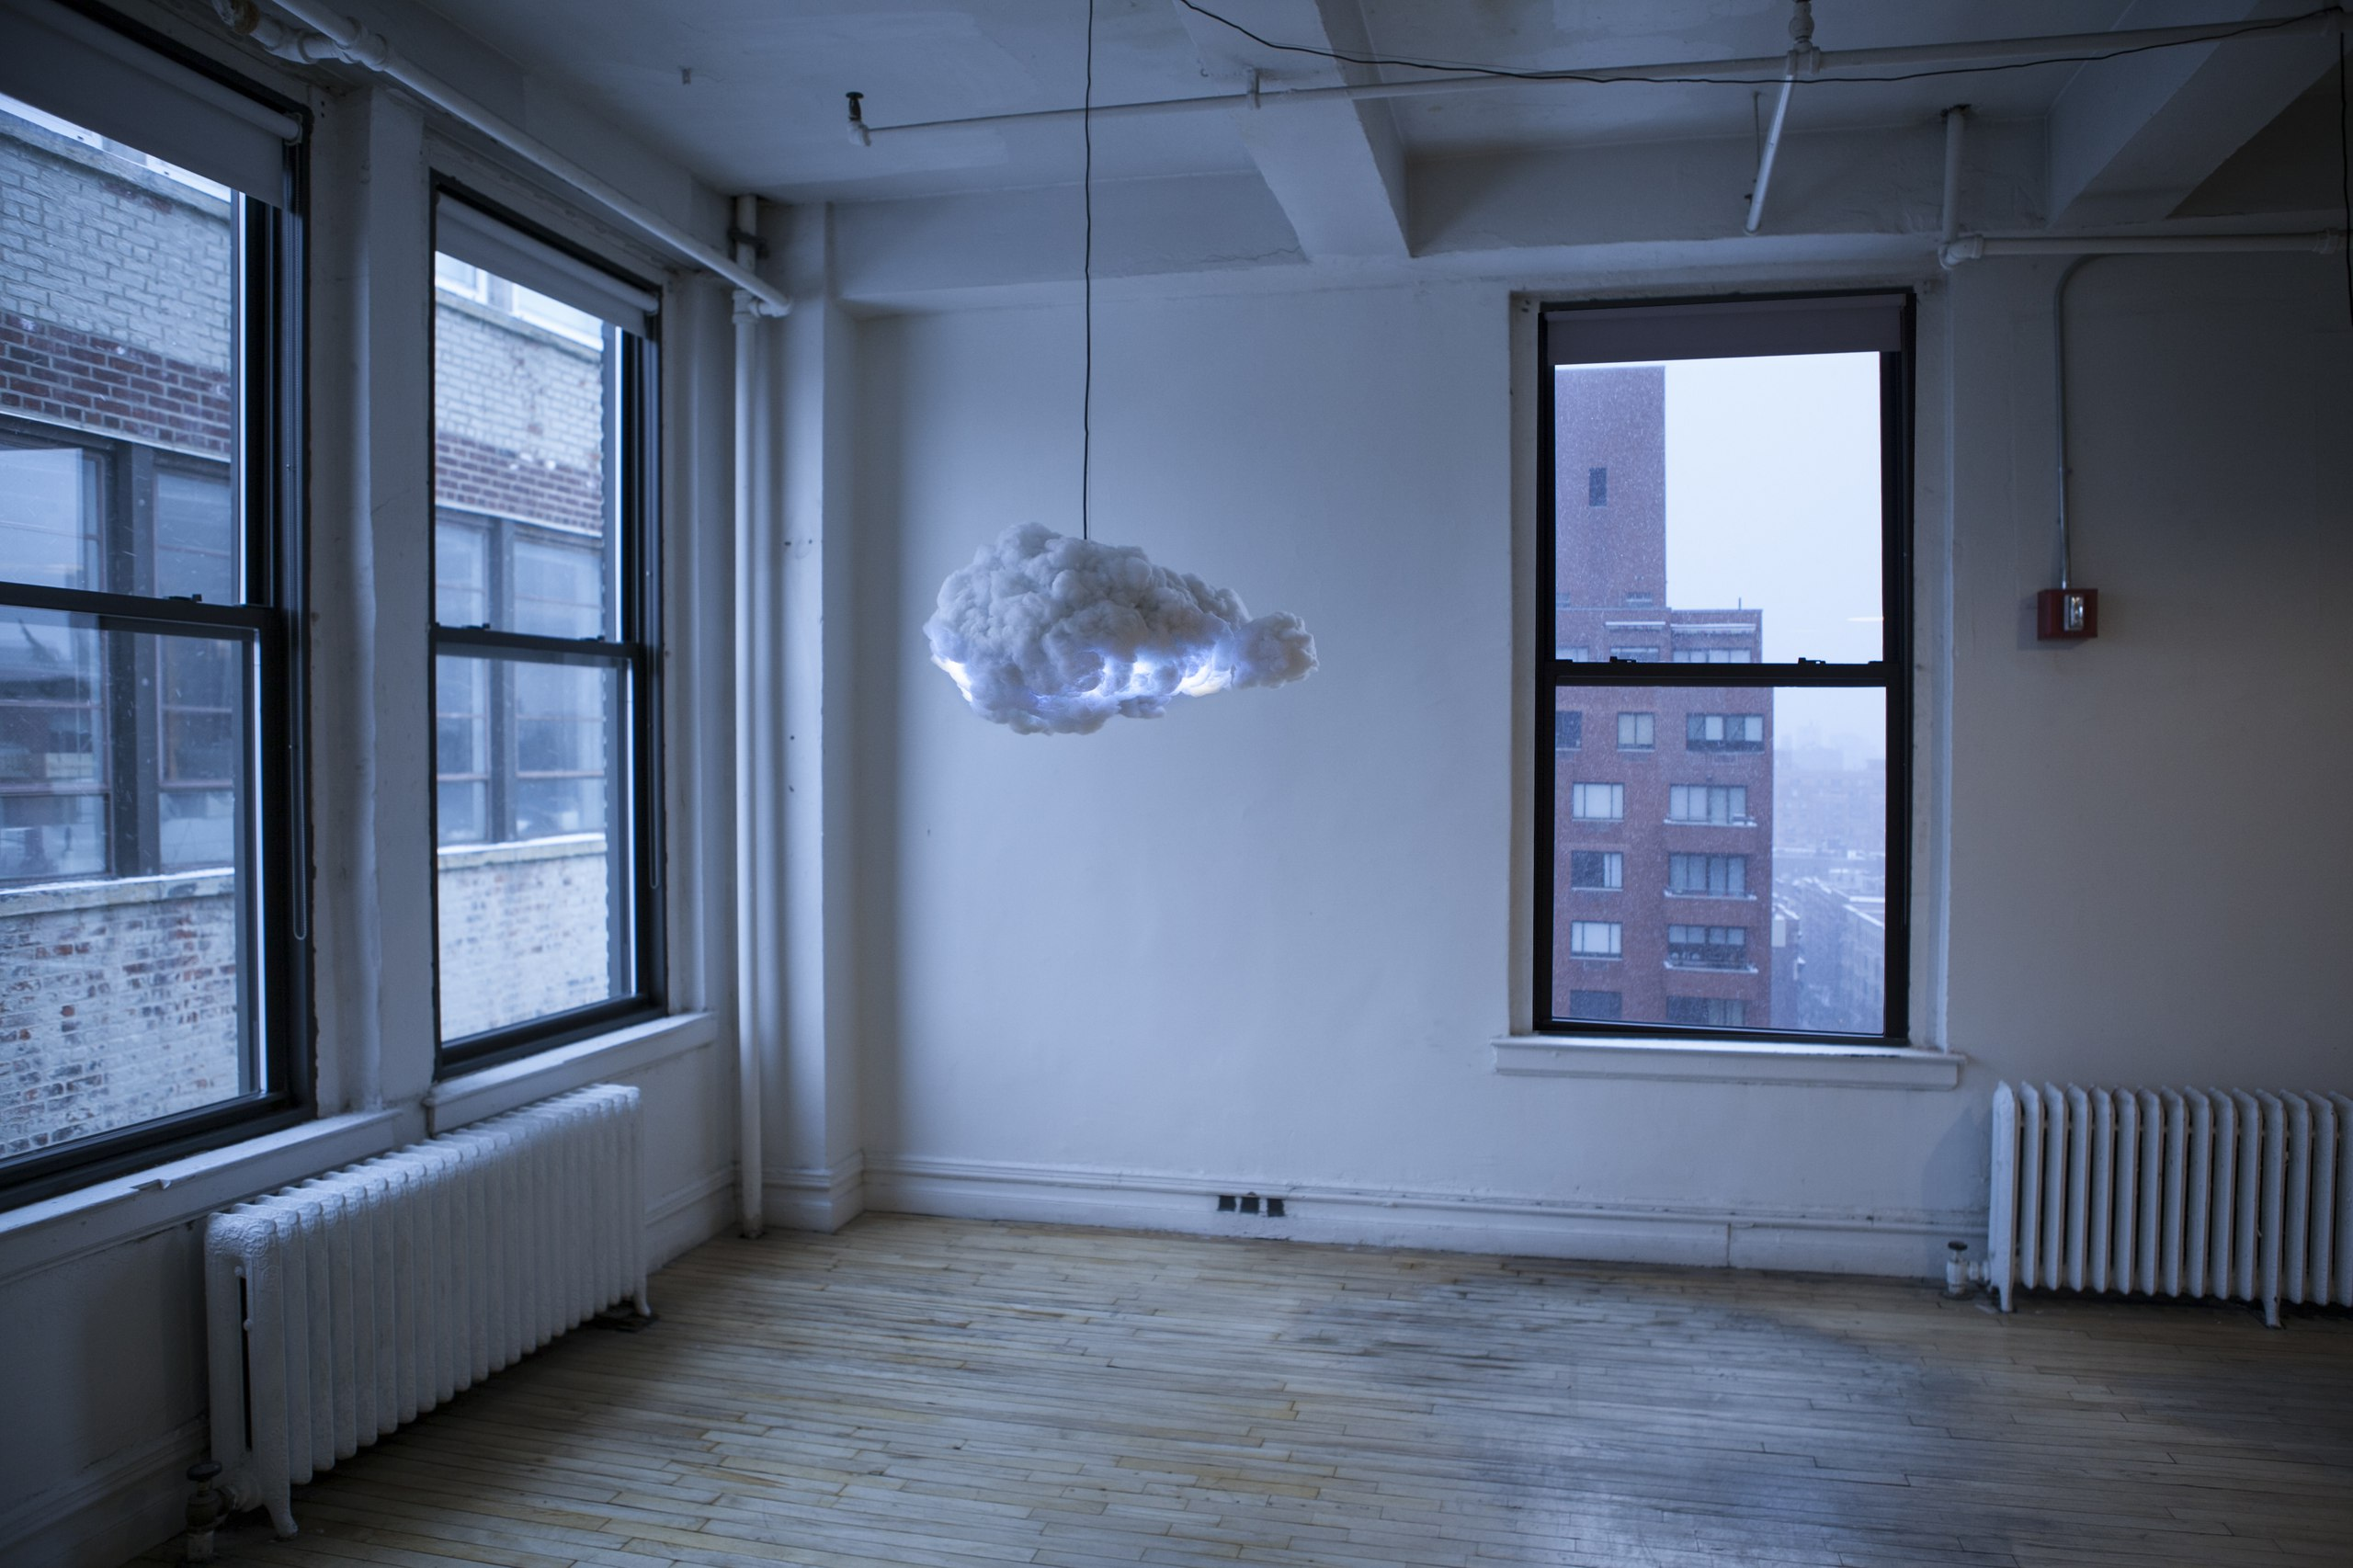 storm cloud lamp, internet of things & design, proyectos iot barcelona, diseñadores iot, diseño de interfaces